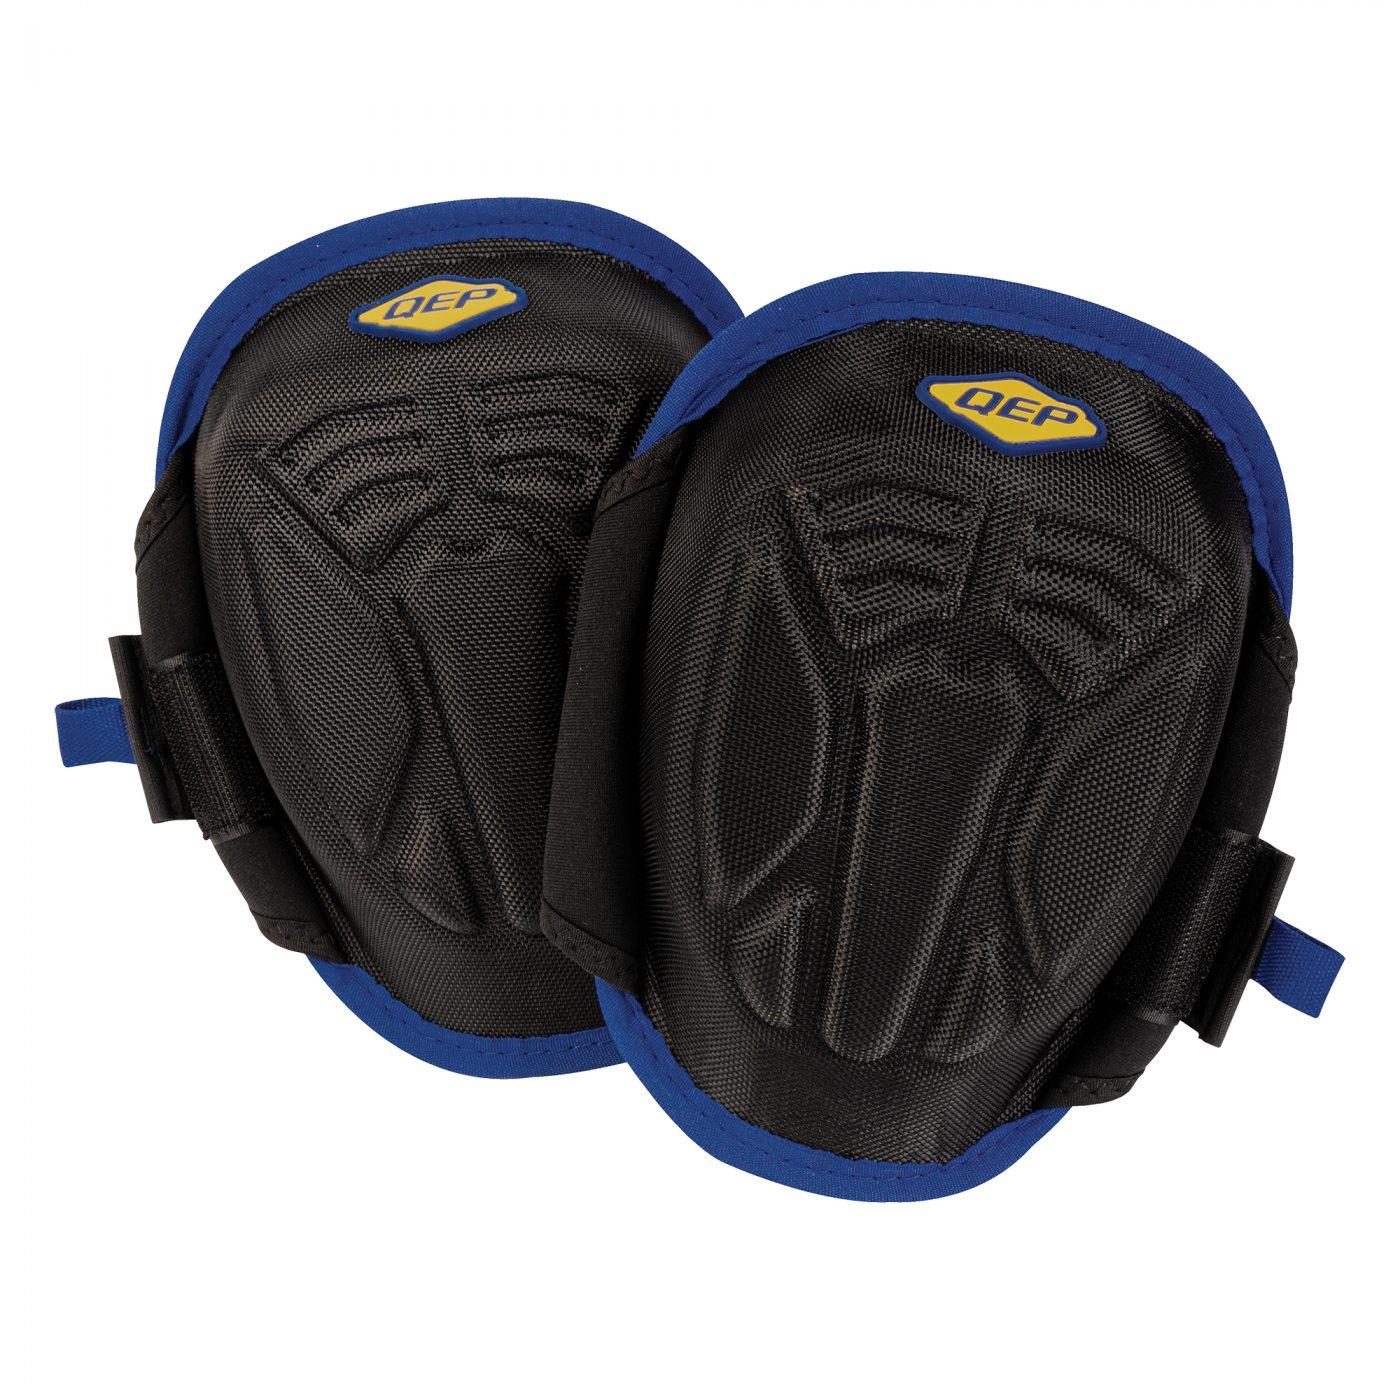 F3 Stabilizer Professional Knee Pads